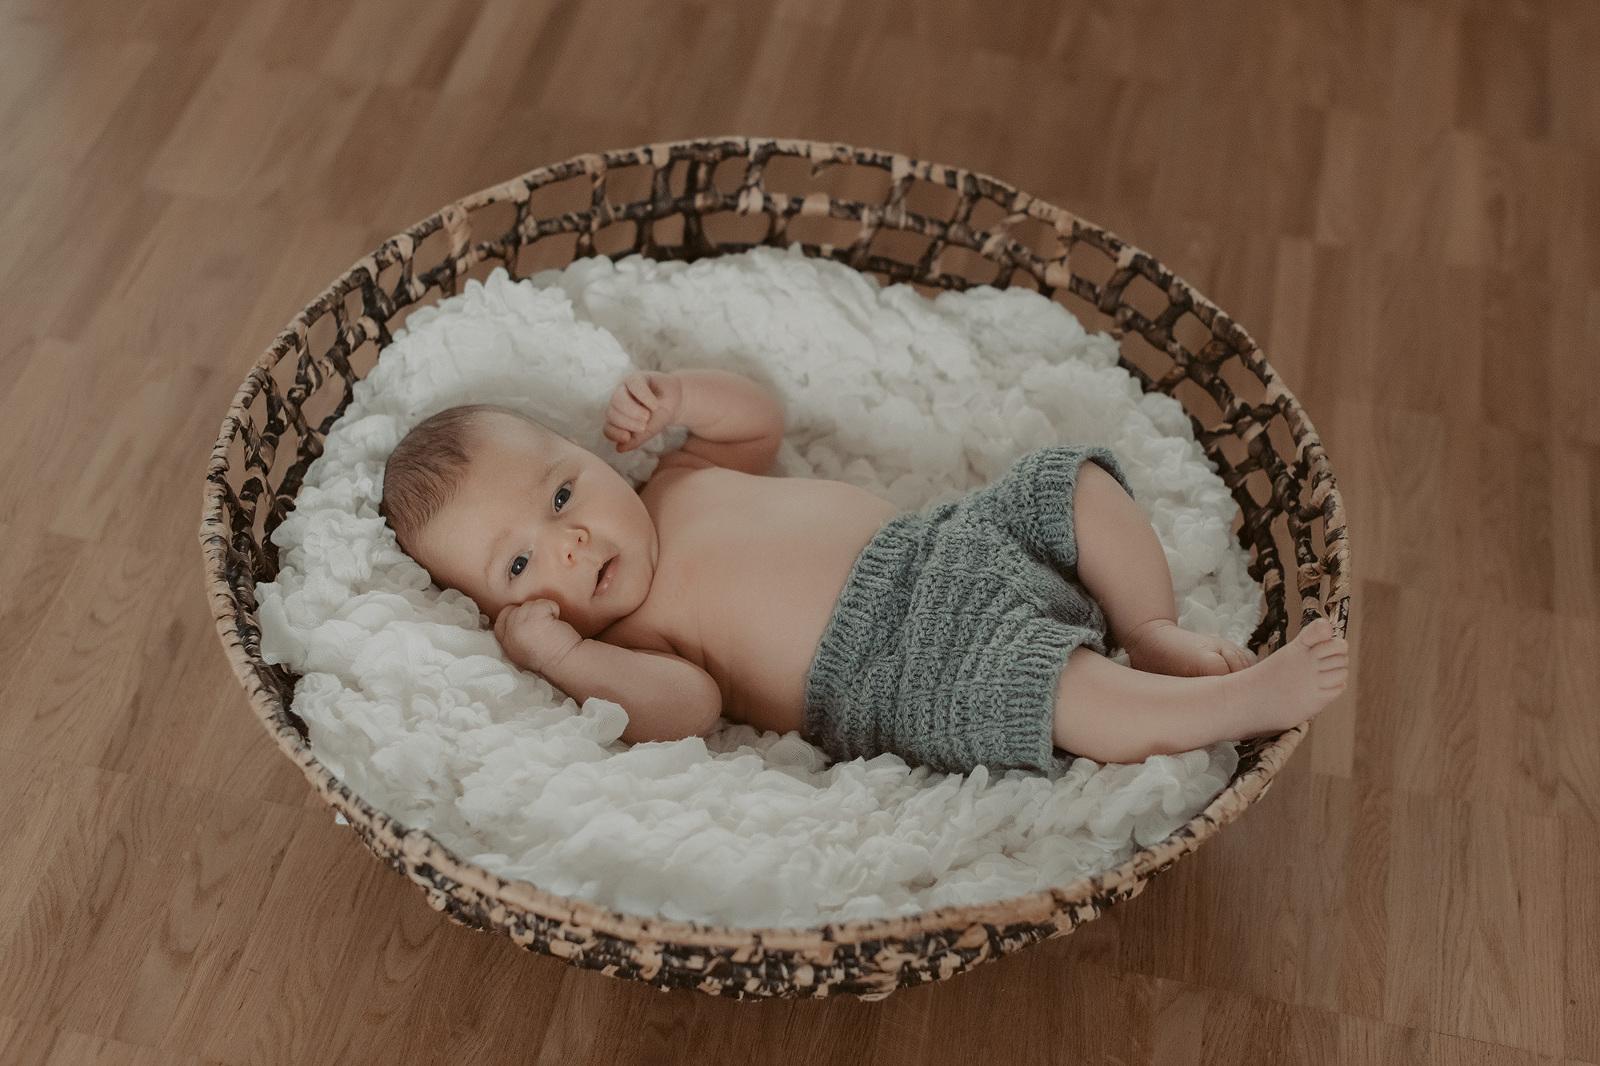 kinderfotograf nidderau babfotografin frankfurt babybilder kinderbilder fotografieren hessen neugeborenenbilder familienbilder